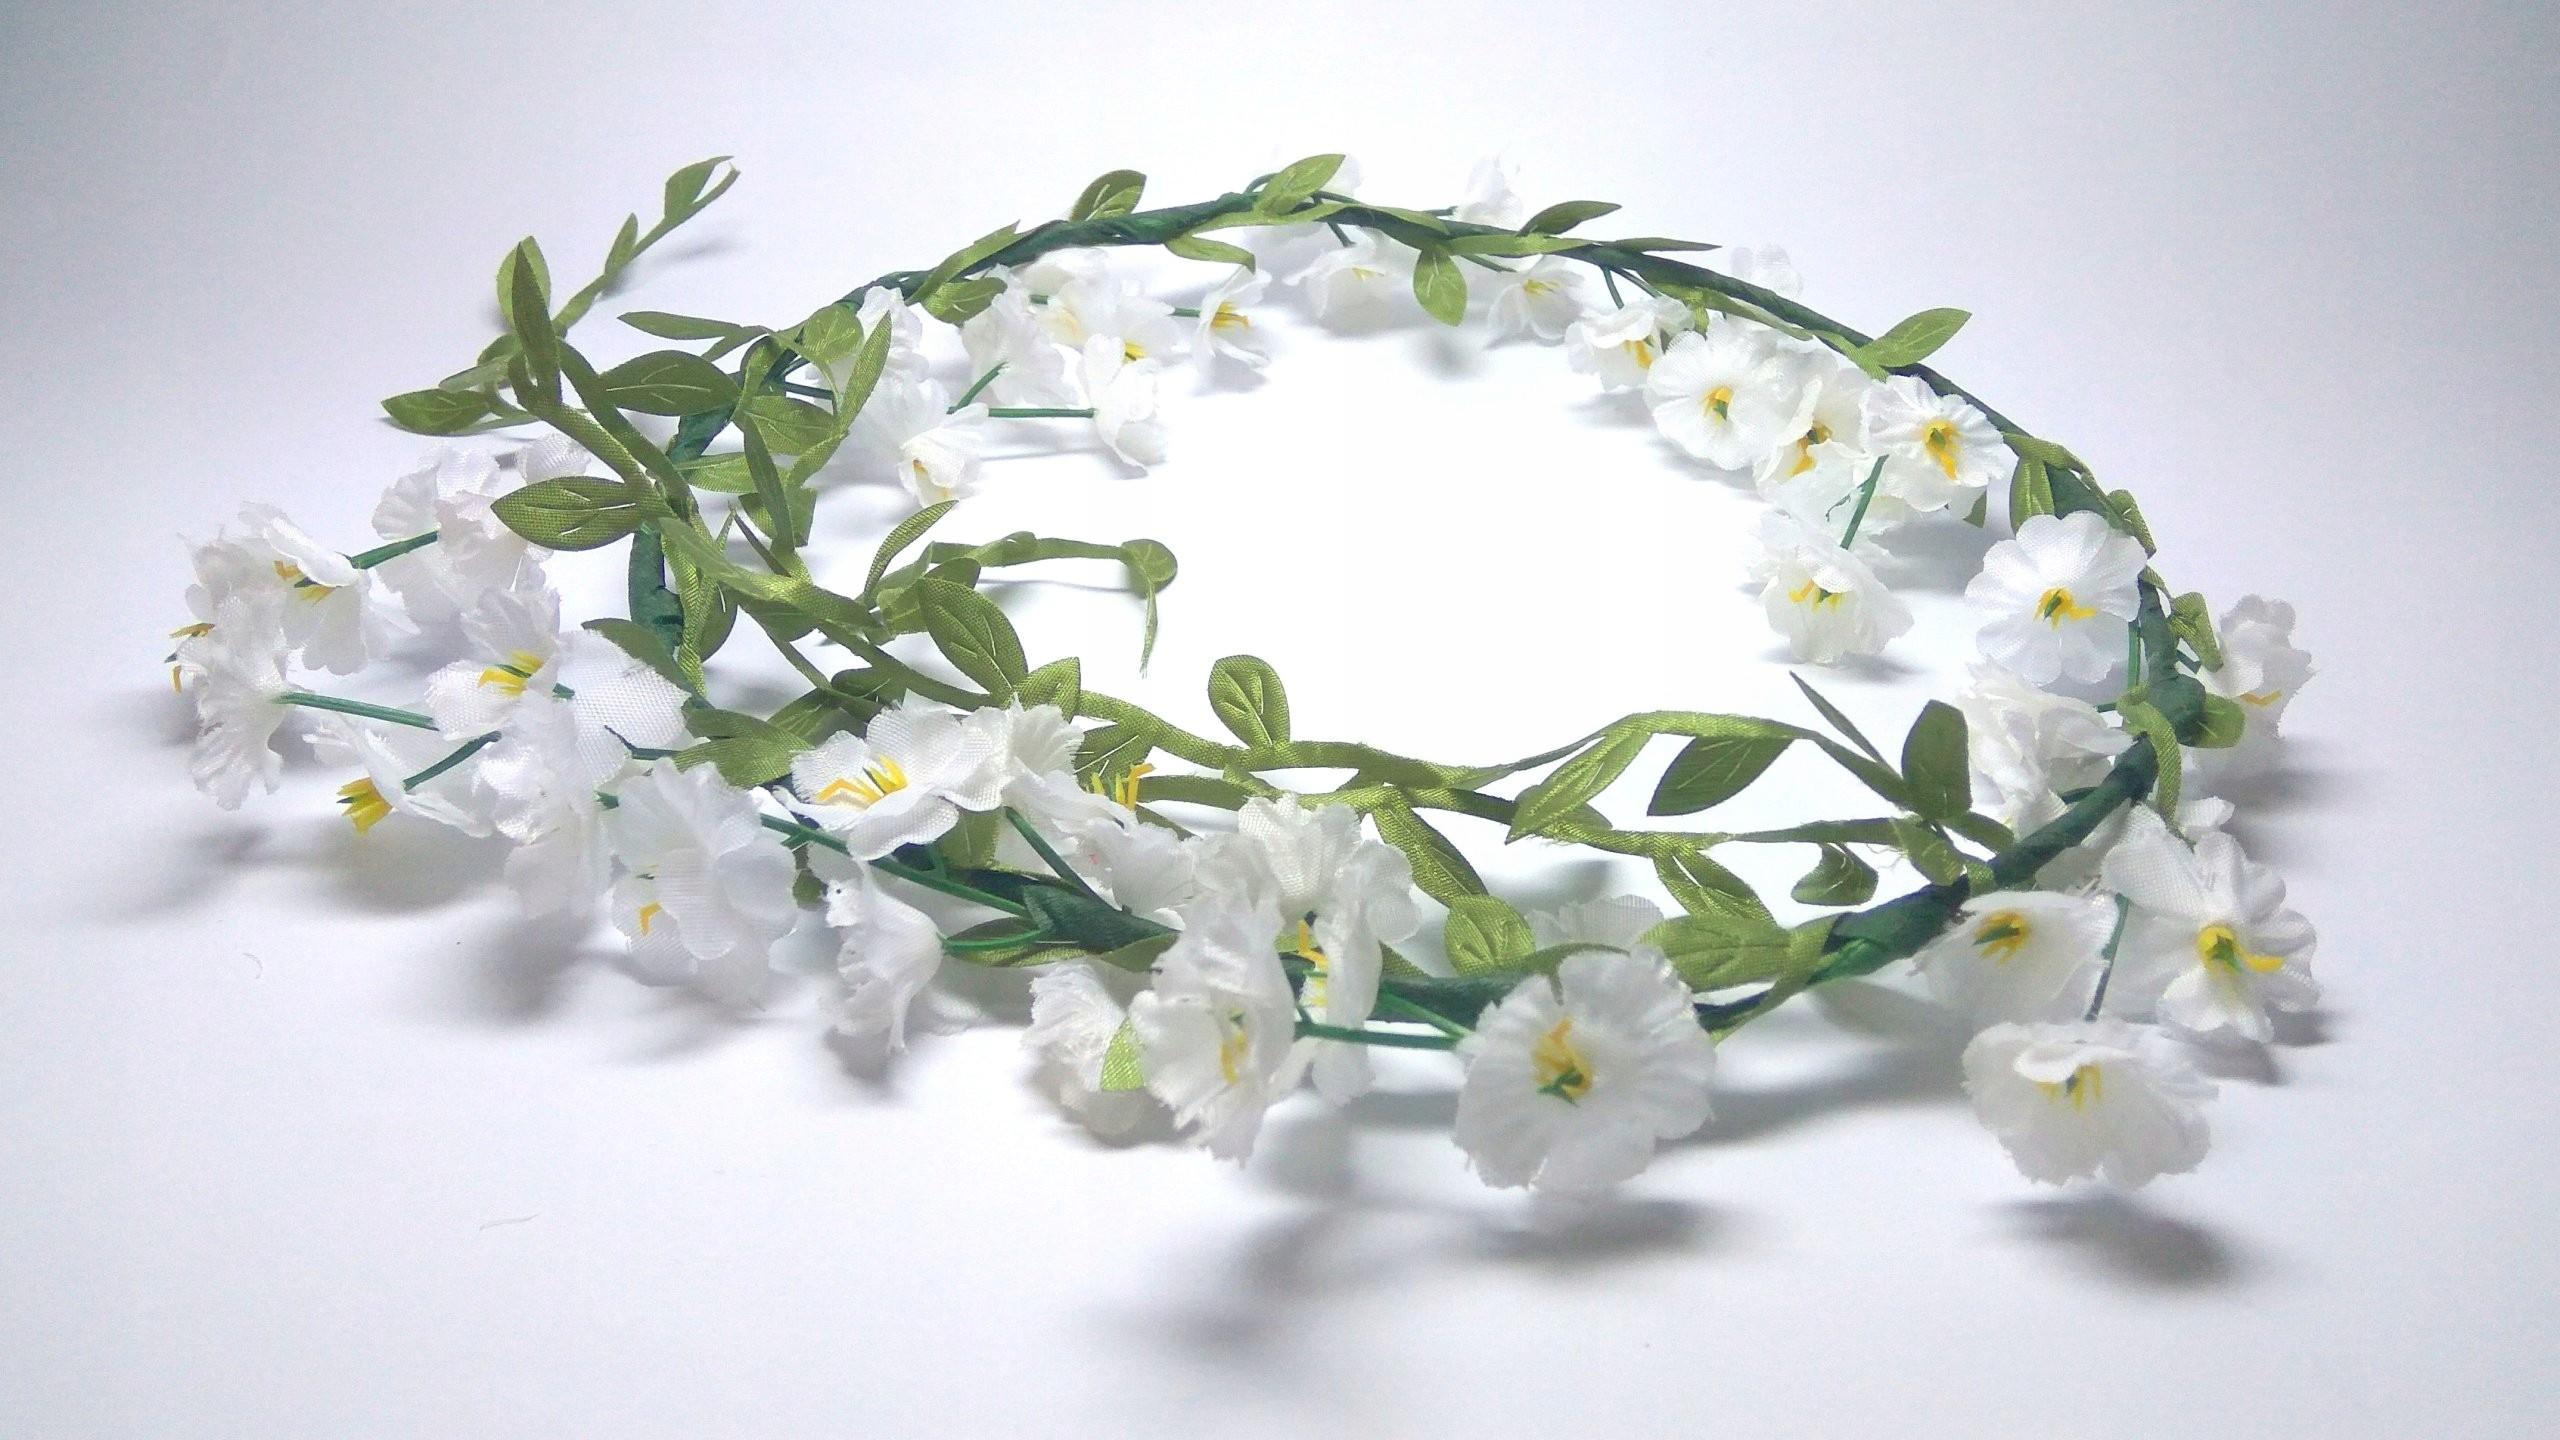 Wianek Girlanda Kwiaty Boho Etno Komunia Wesele 7232257801